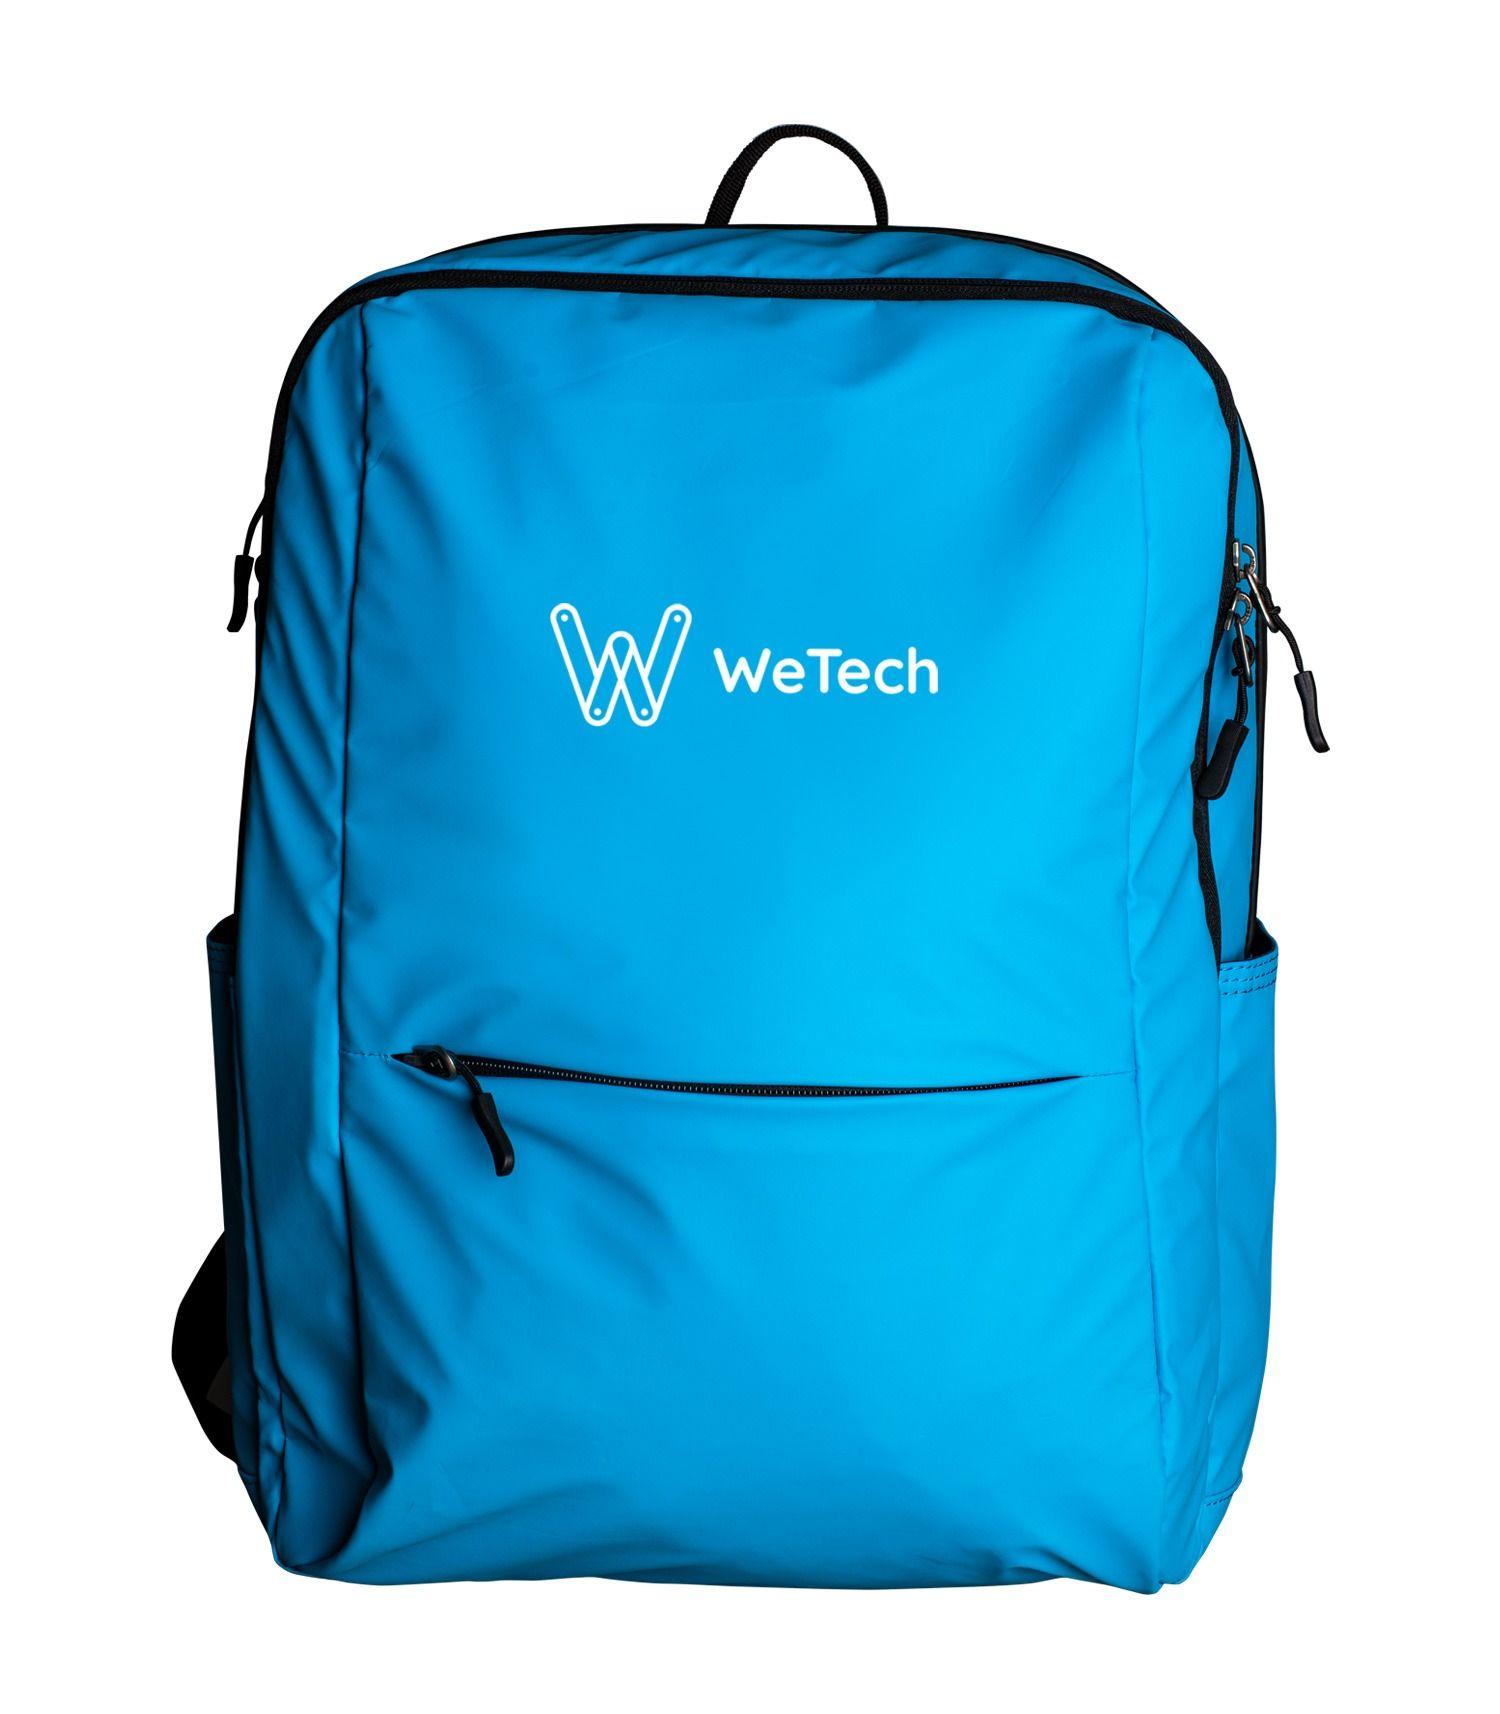 Weatherproof Backpack